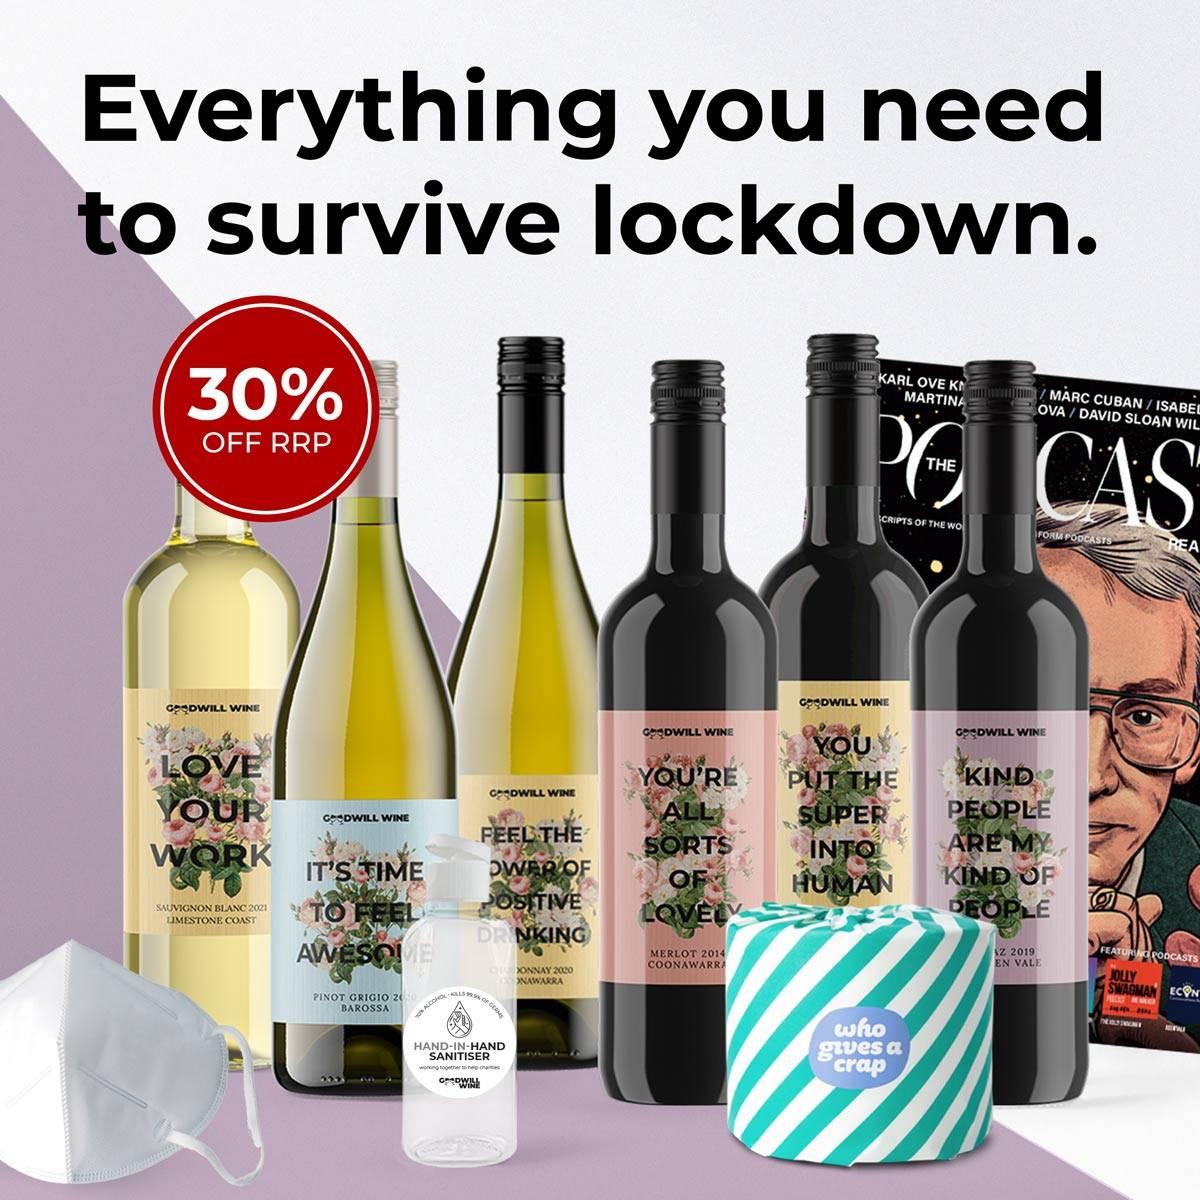 Lockdown Survival Kit